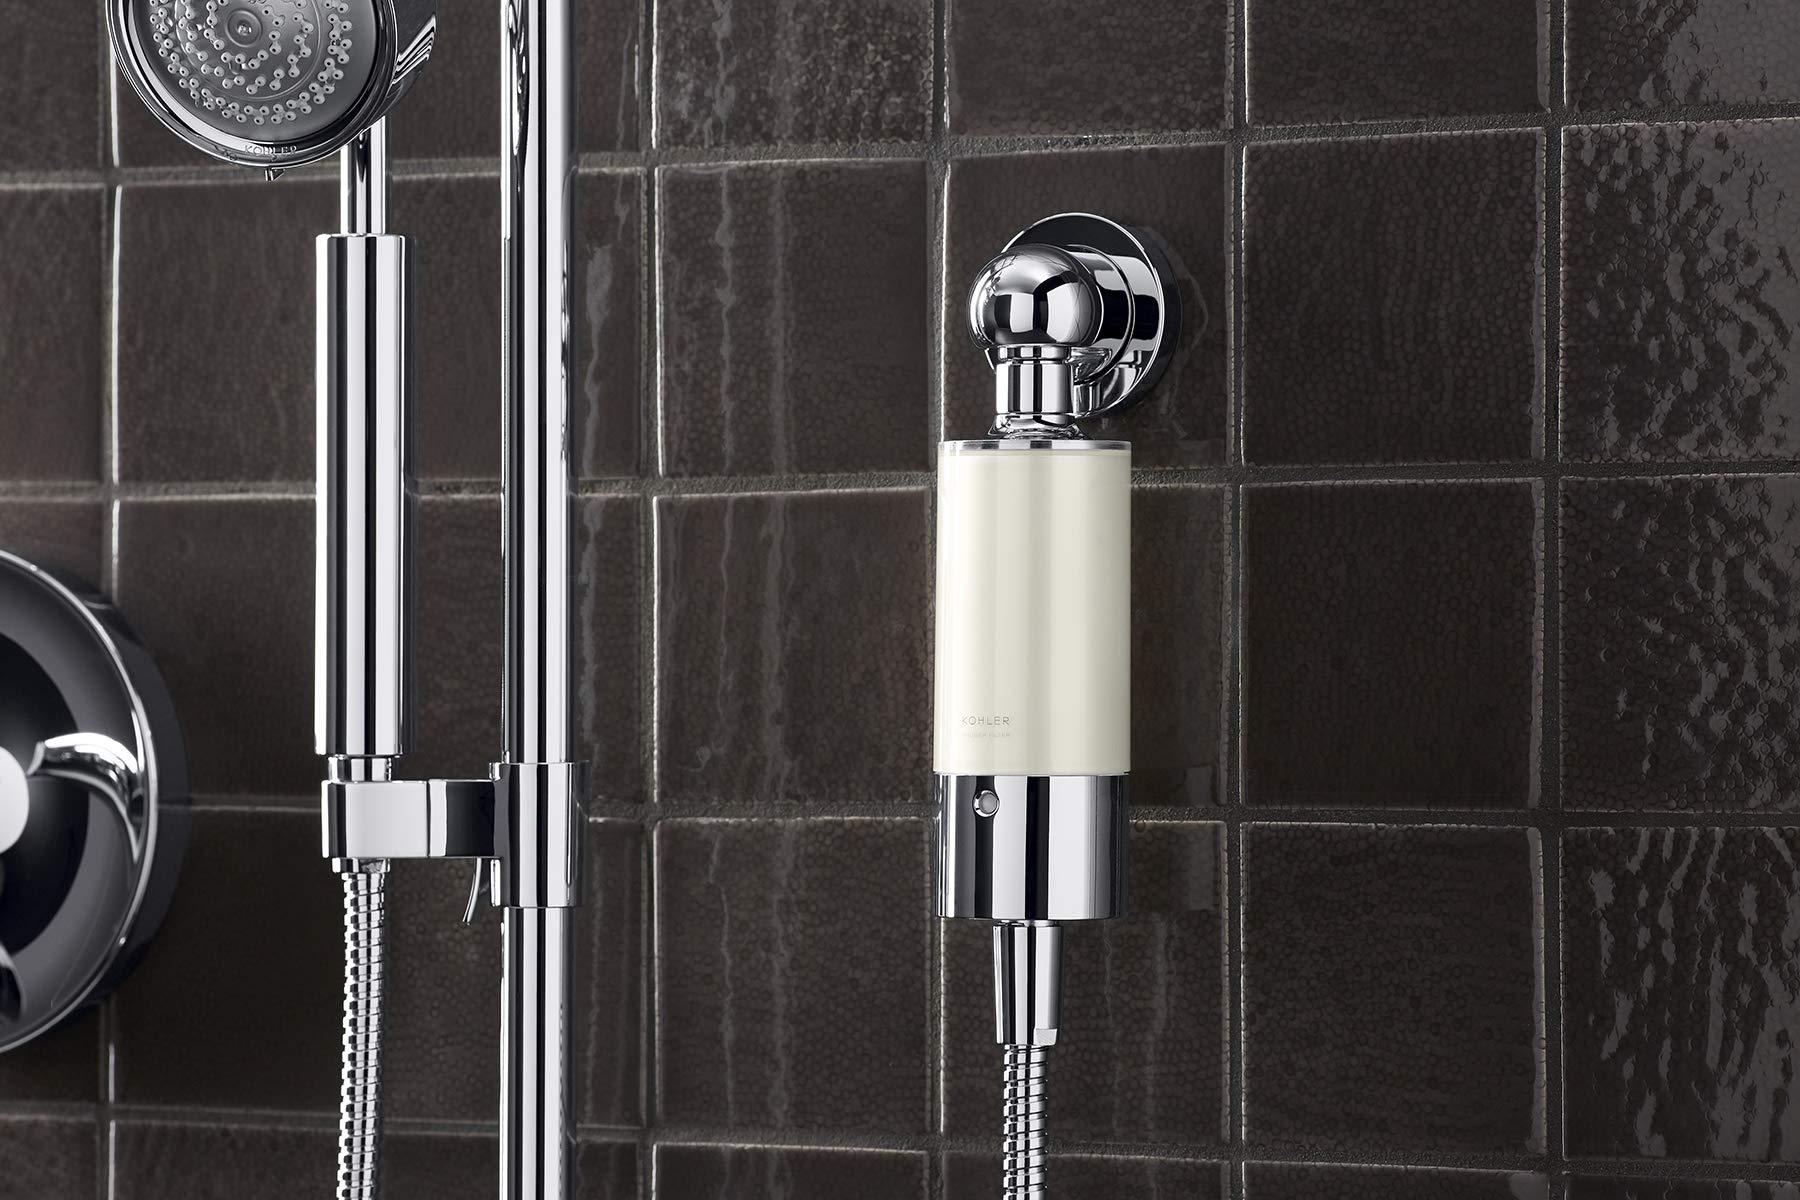 Kohler 30646-CP Aquifer Shower Water Filtration System, Reduce Chlorine and Odor, Includes Filter Replacement by Kohler (Image #3)